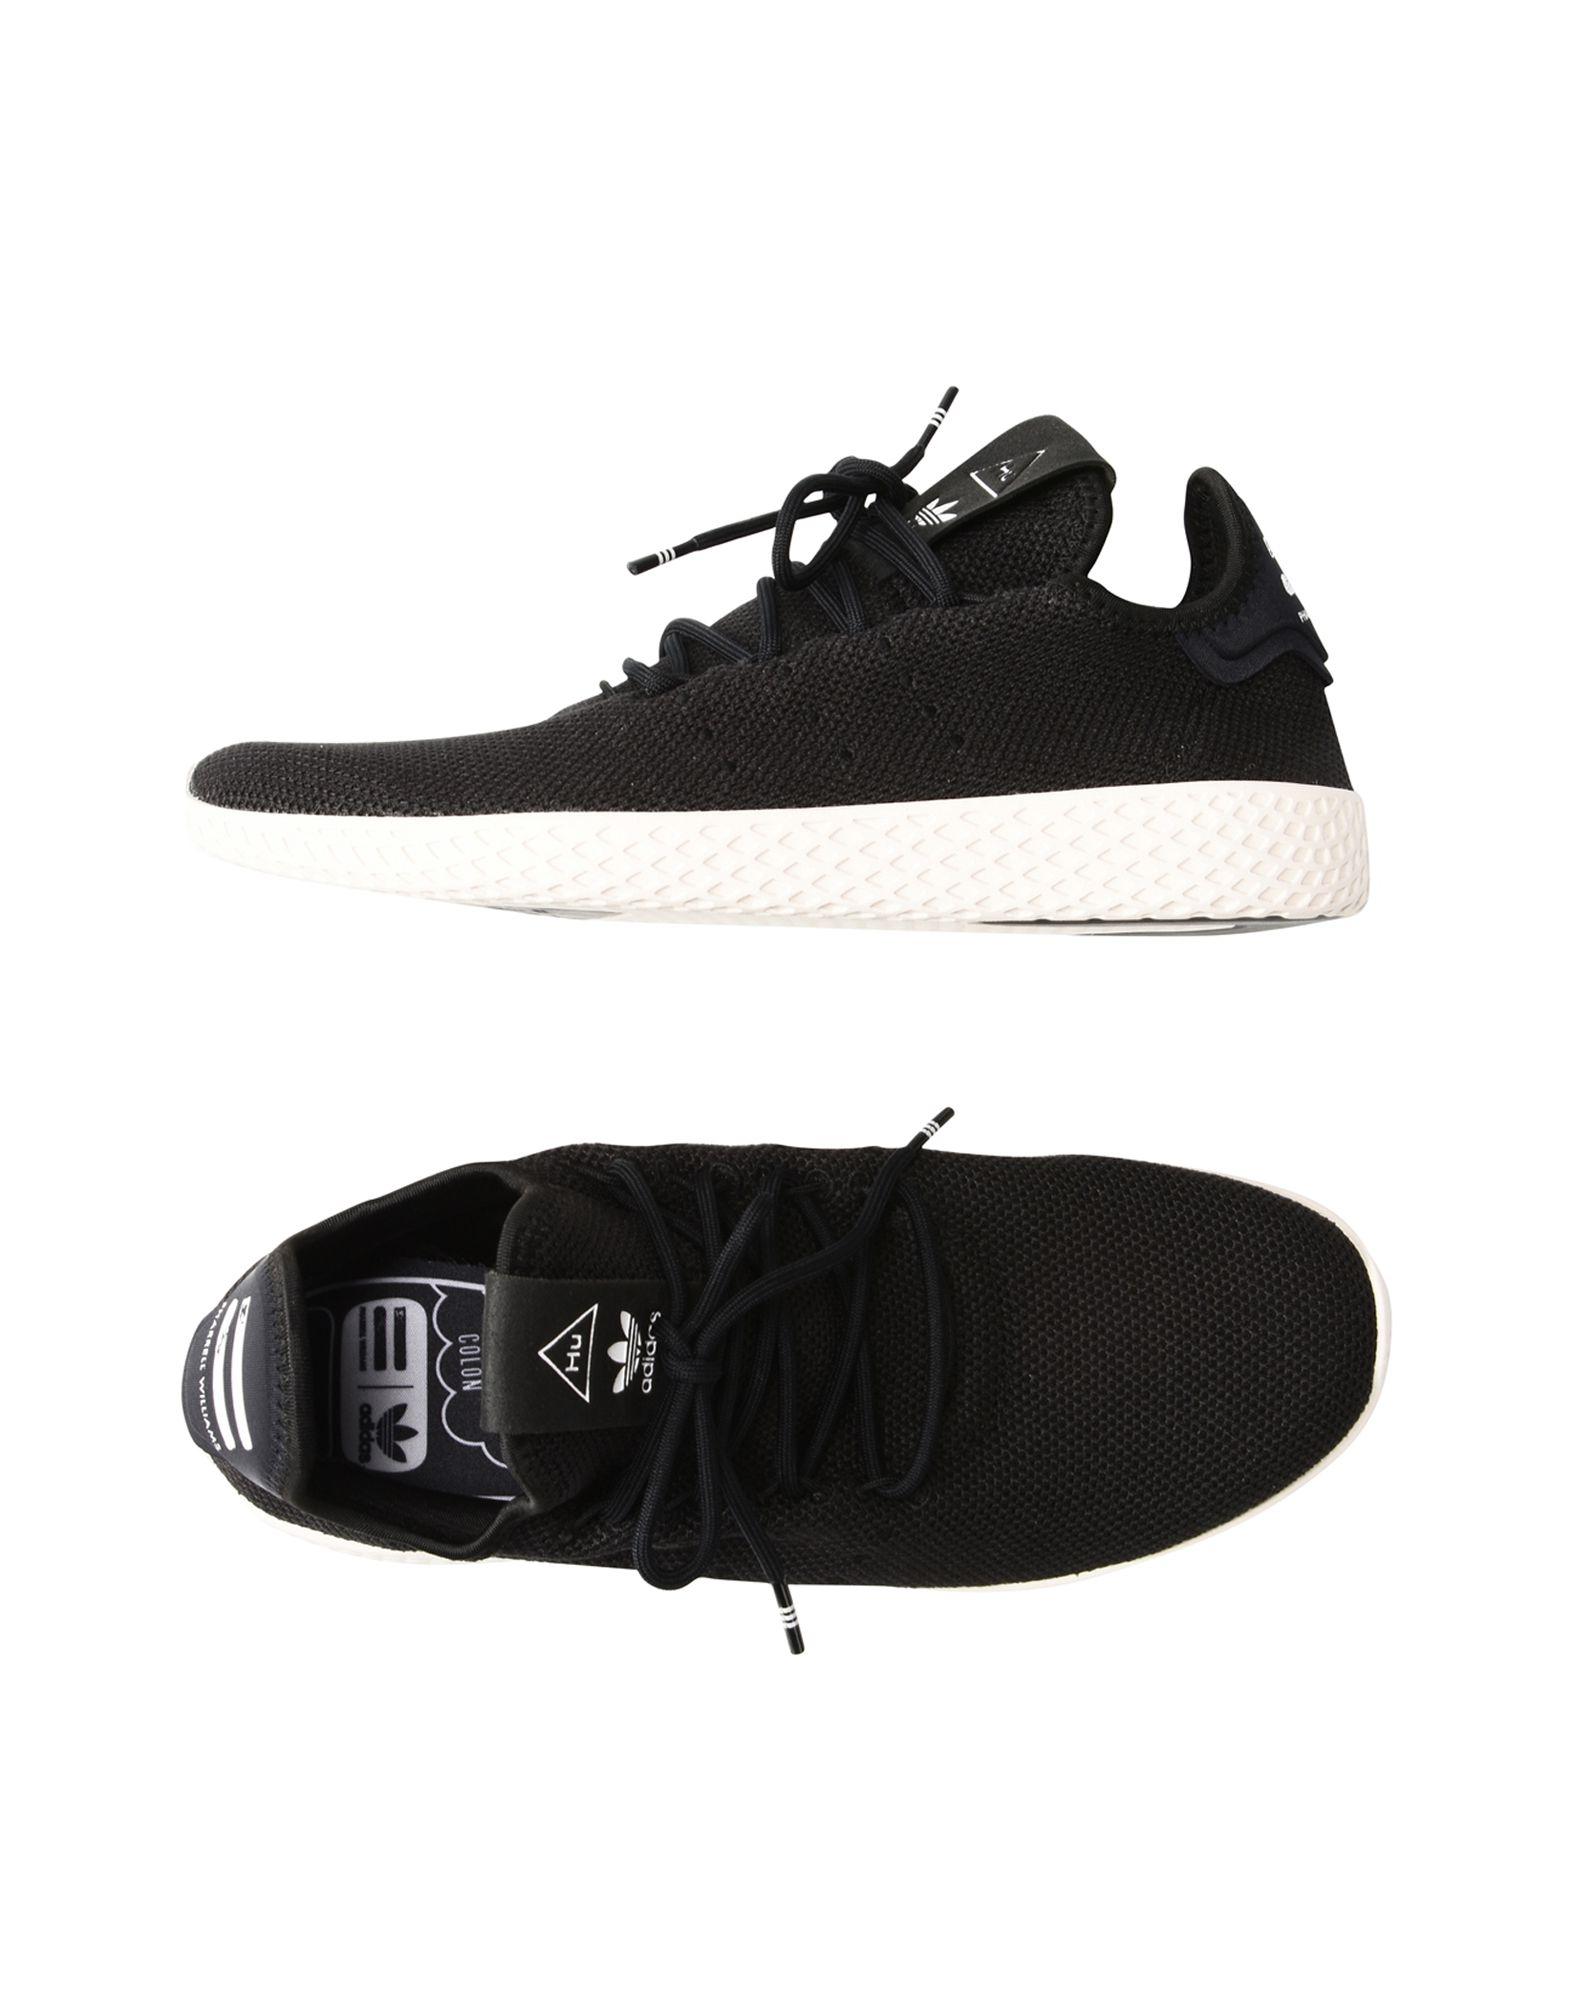 Sneakers Adidas Originals By Pharrell Williams Pw Tennis Hu - Uomo - 11533657RX